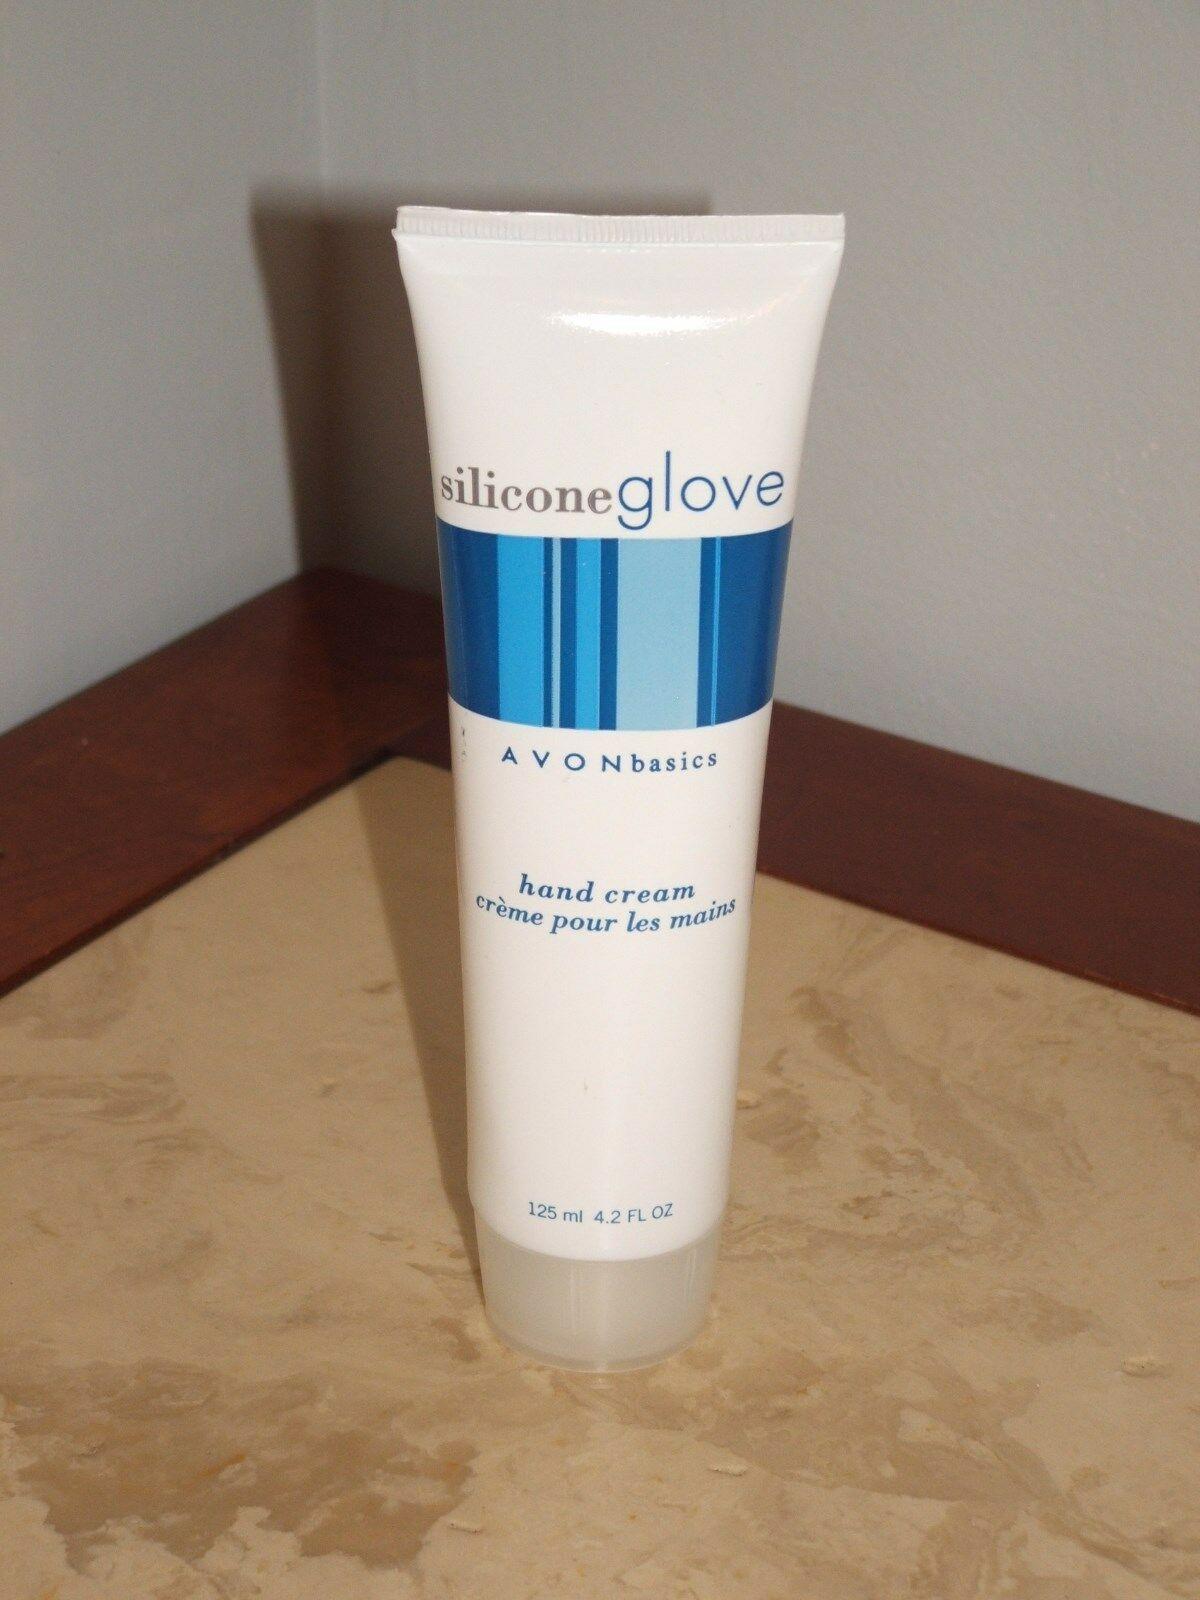 brand new unopened avon silacone glove hand cream